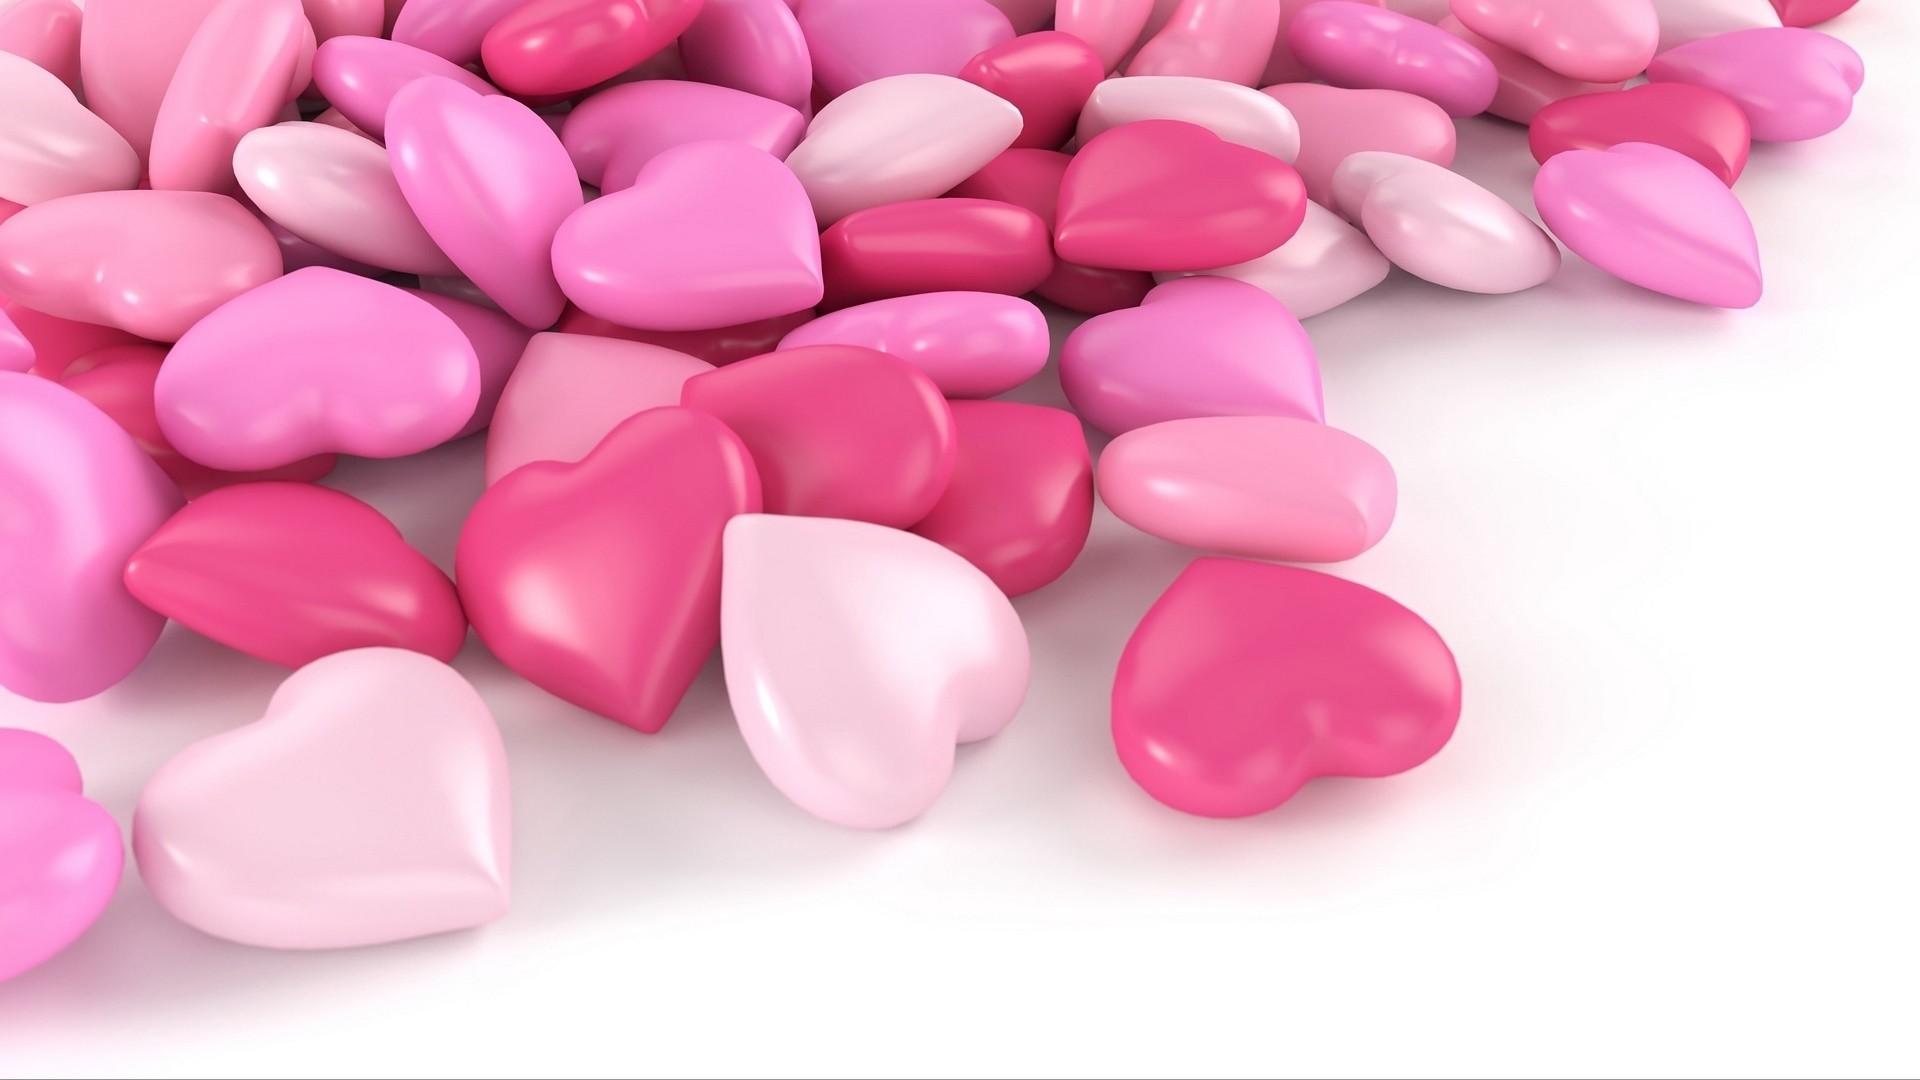 Pink Heart Full HD Wallpaper